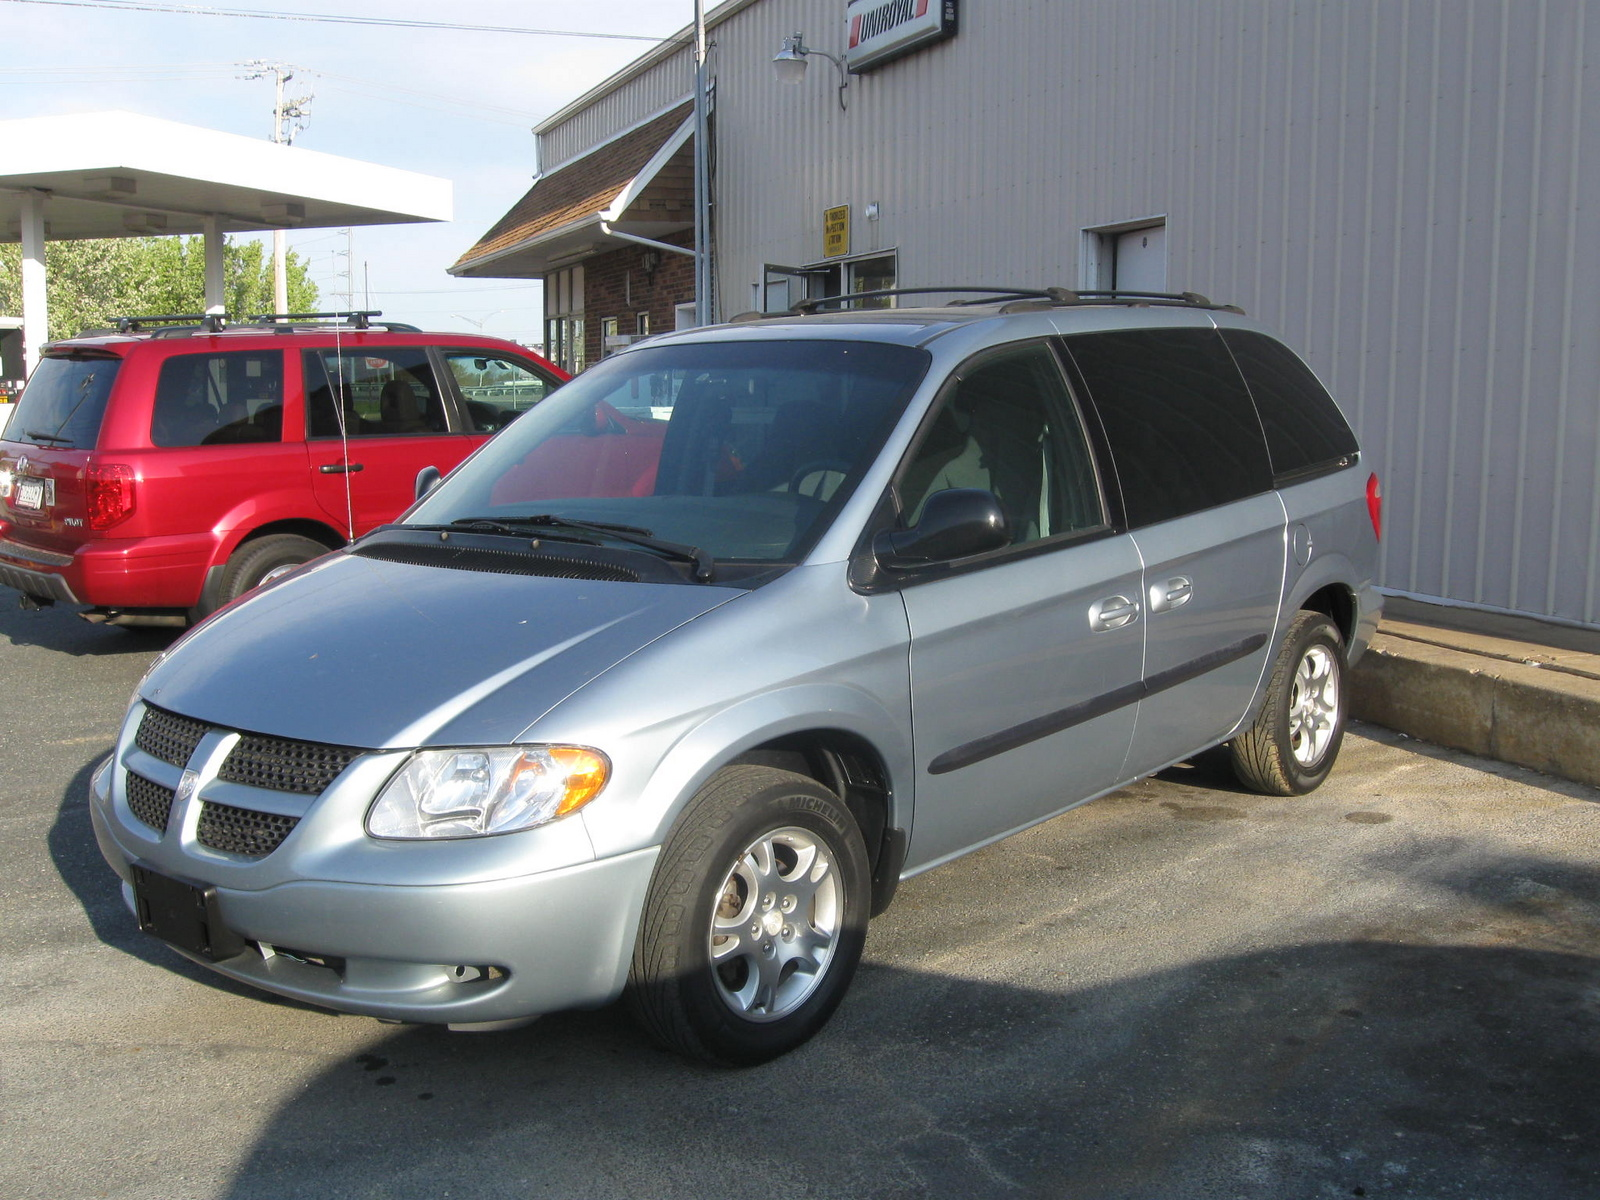 2004 Dodge Caravan Pictures Cargurus